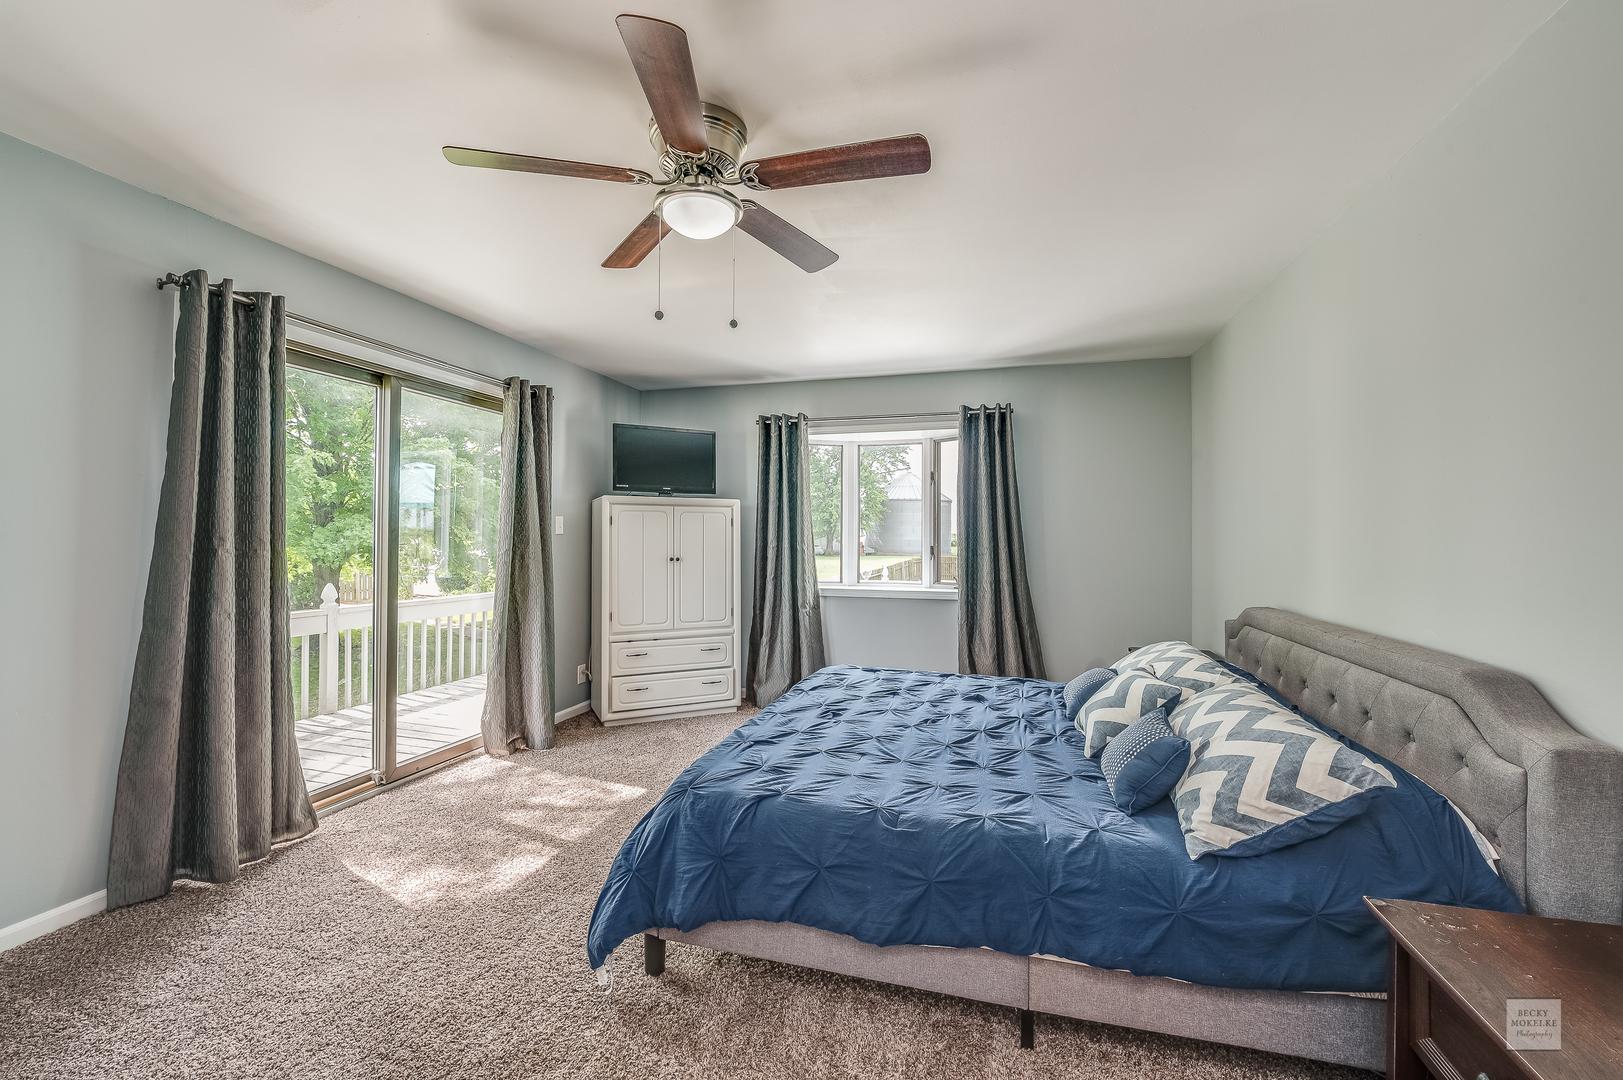 10326 Galena, Bristol, Illinois, 60512